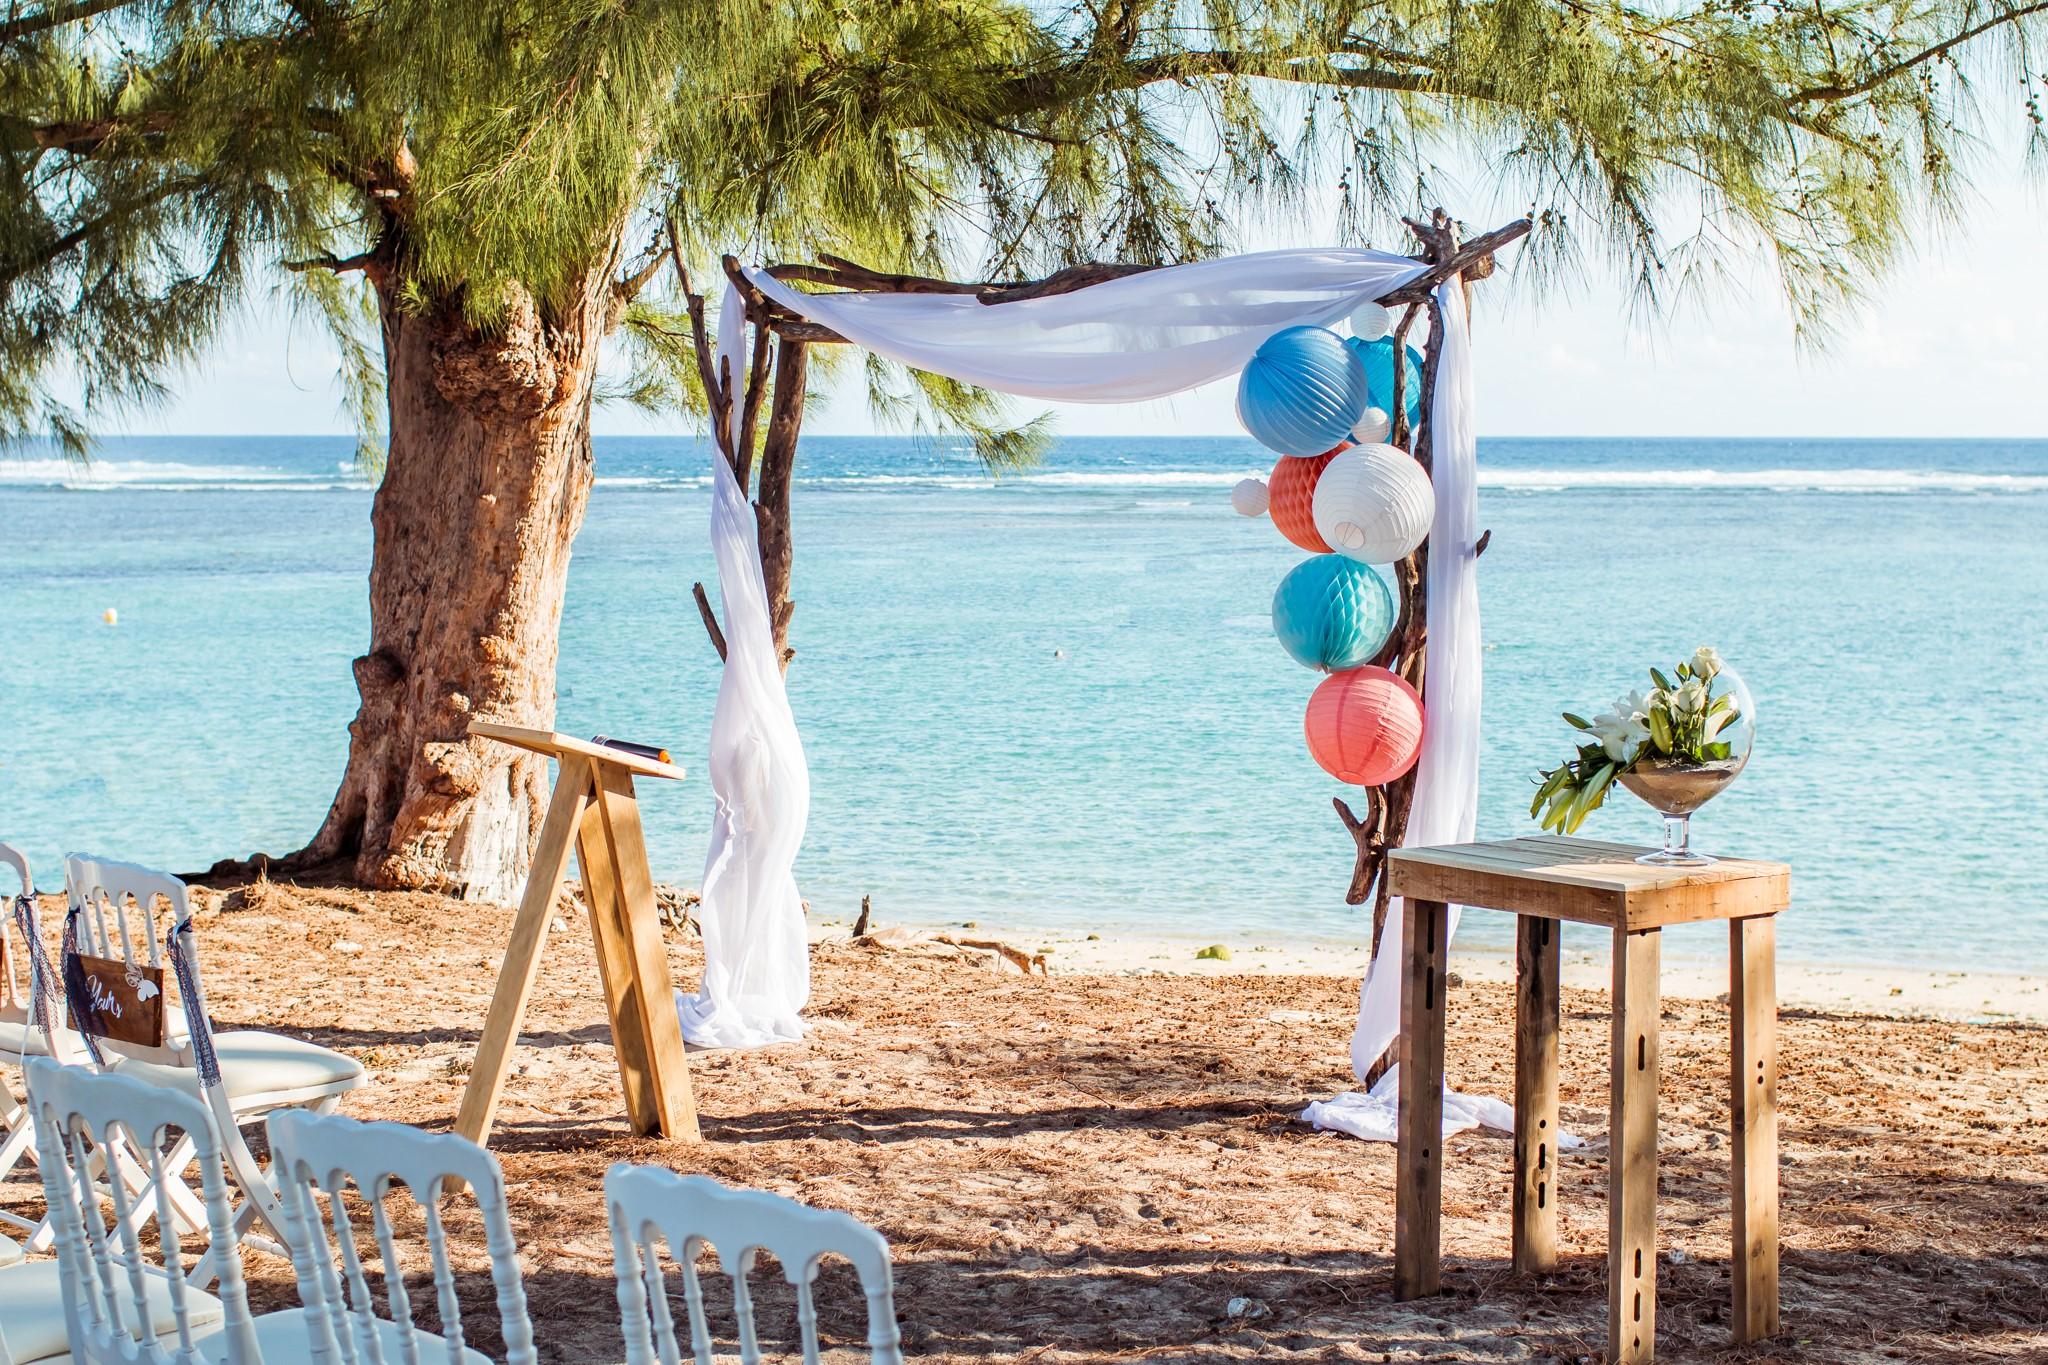 Lanterne mariage: thème bleu et bord de mer